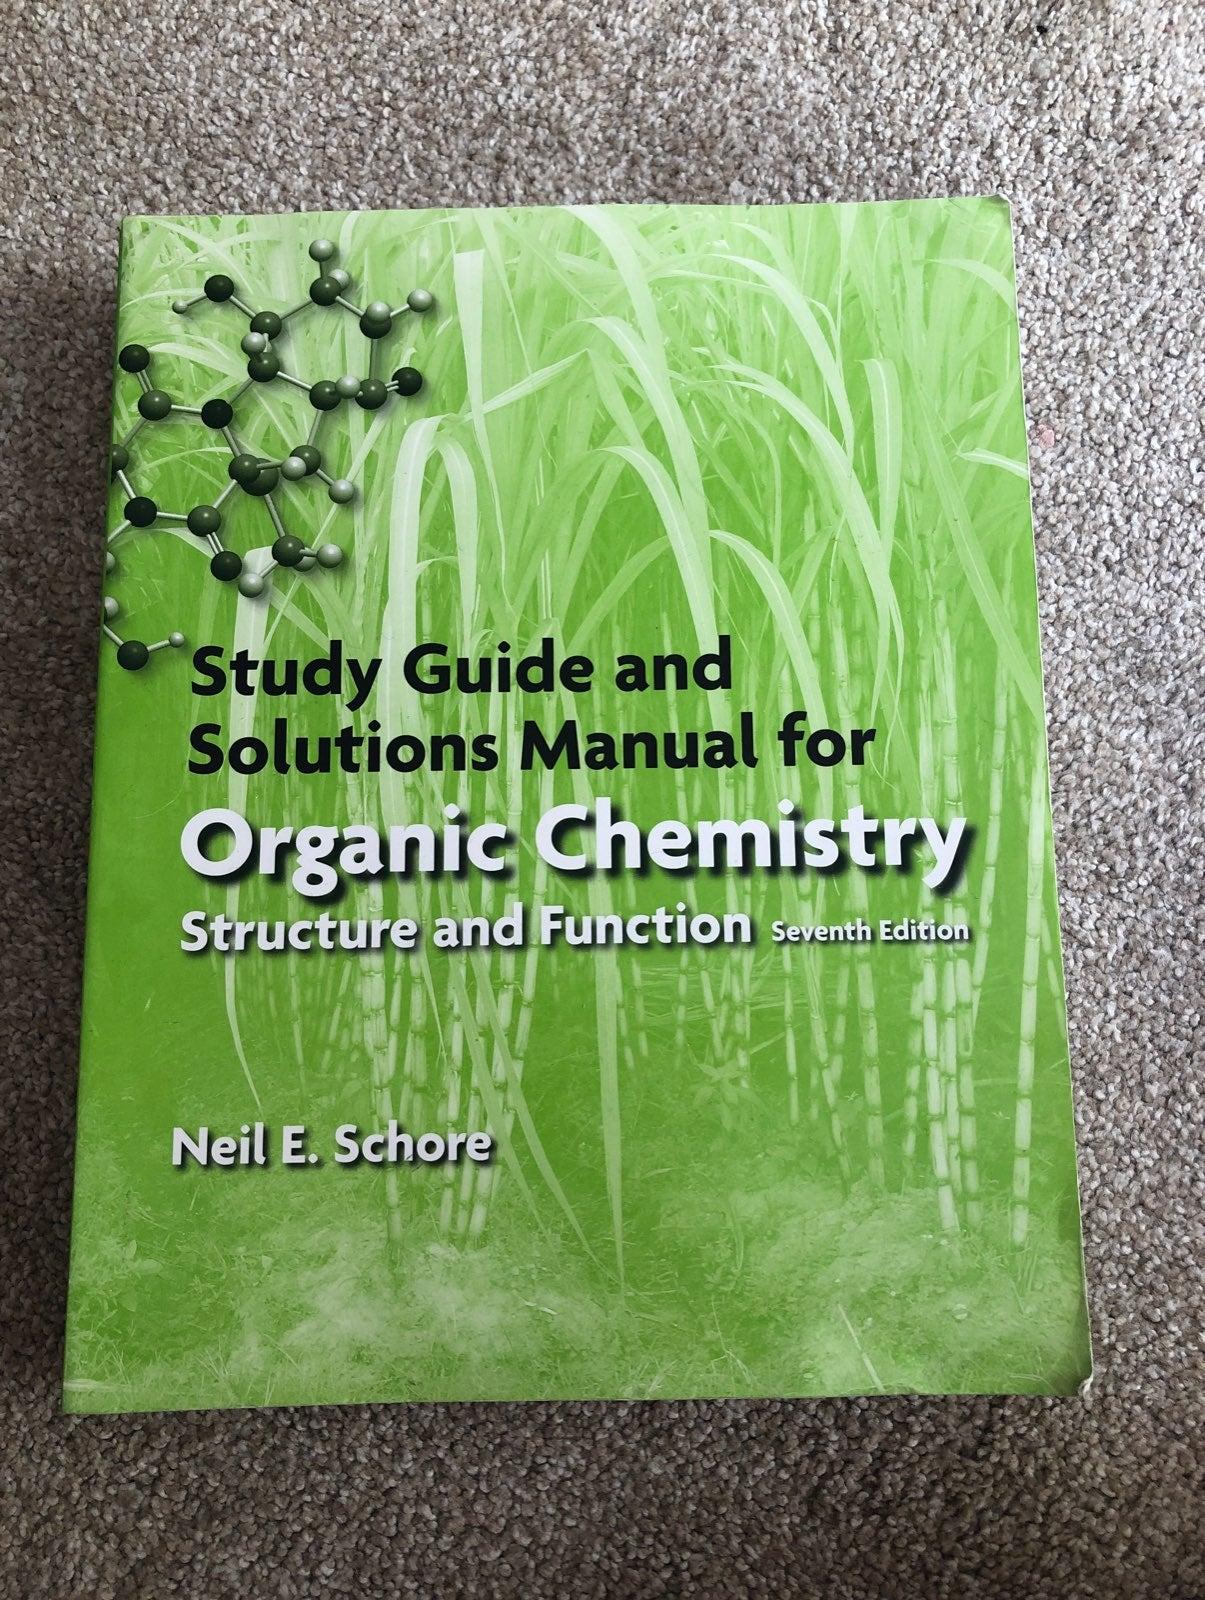 Organic Chemistry Textbook